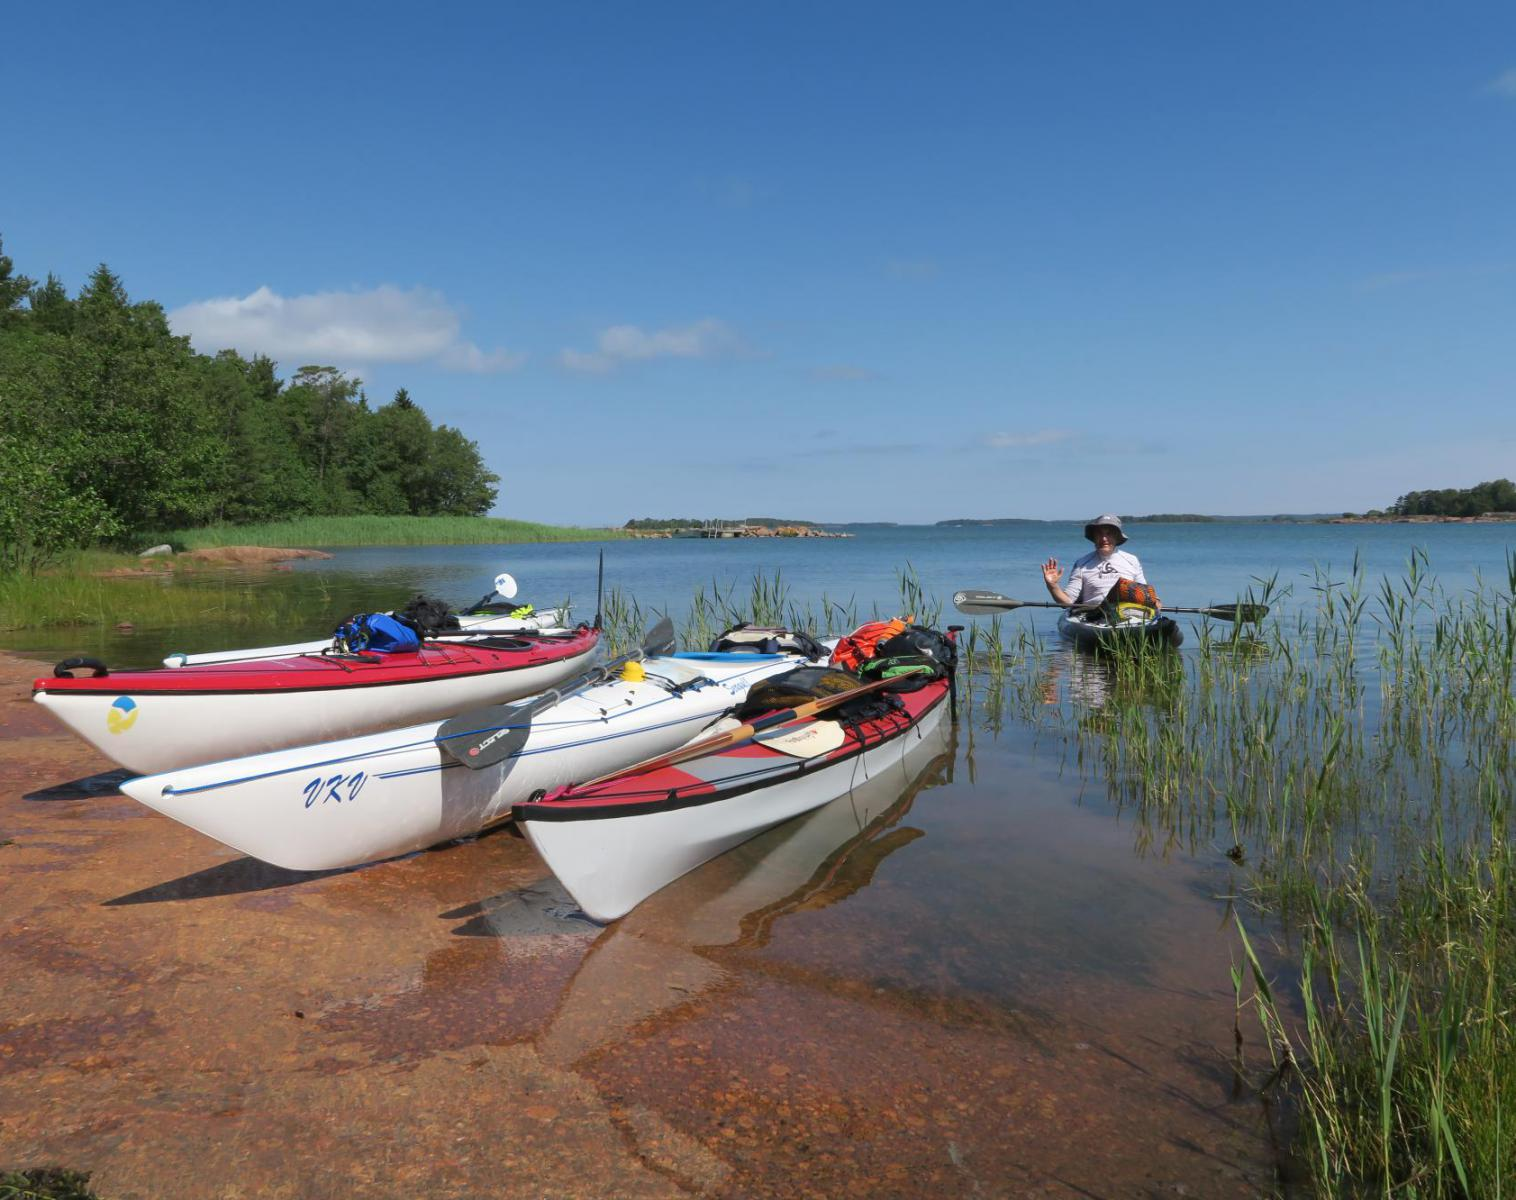 Finlande  L'Archipel d'Åland en Kayak de mer   Kayak & Canoë